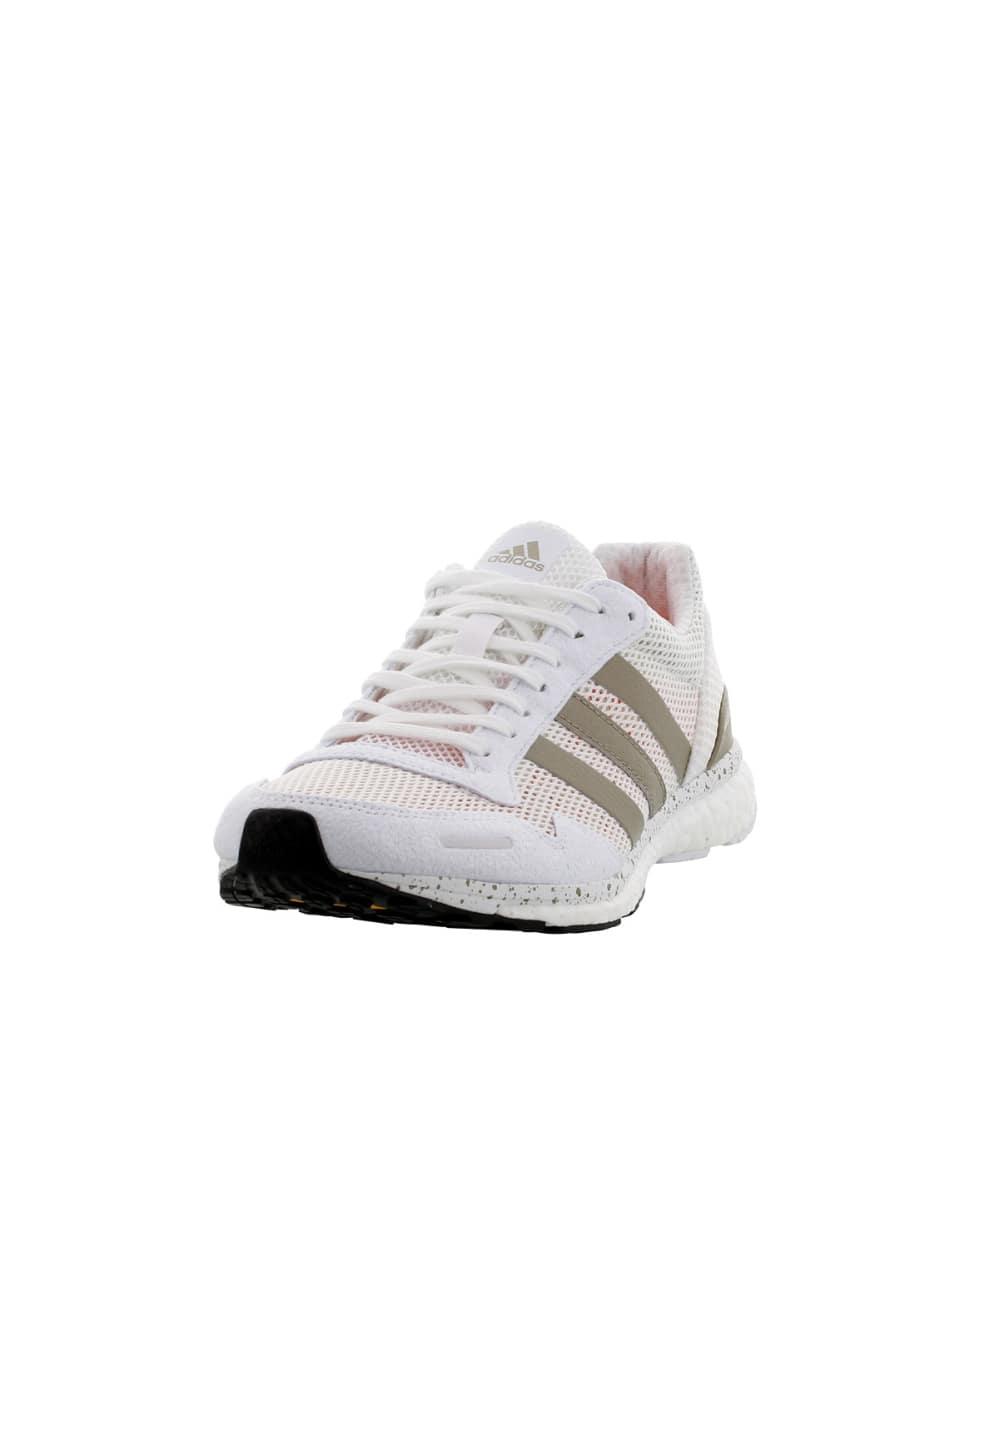 check out 16ae9 96b8f Next. -60%. adidas. adiZero Adios - Laufschuhe für Damen